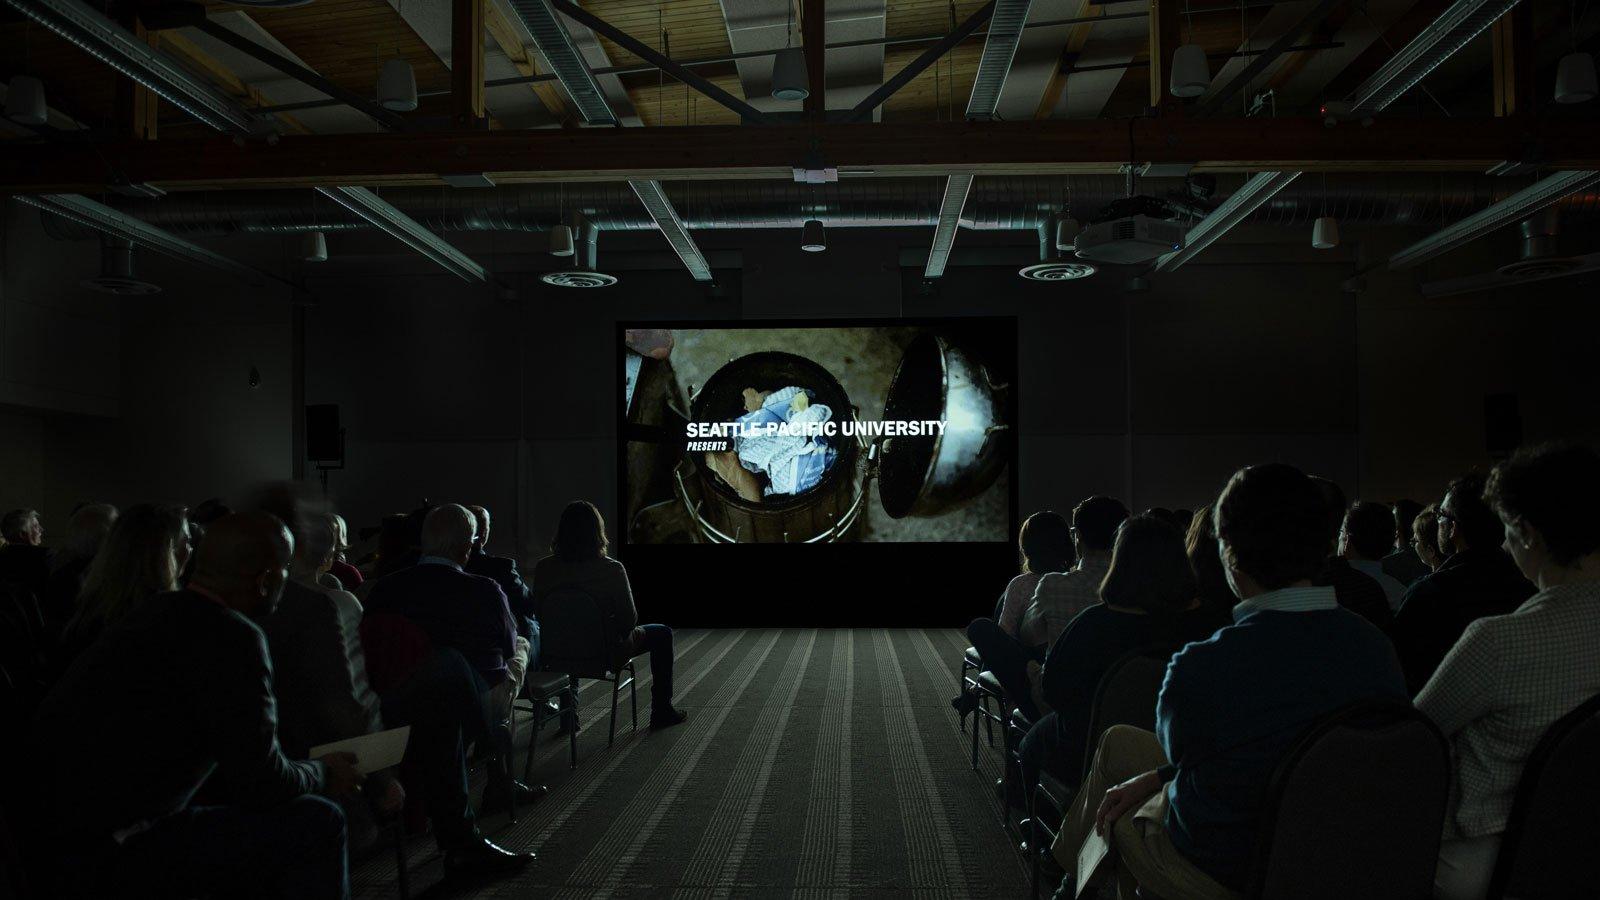 SPU Screening of Faith & Co. film series